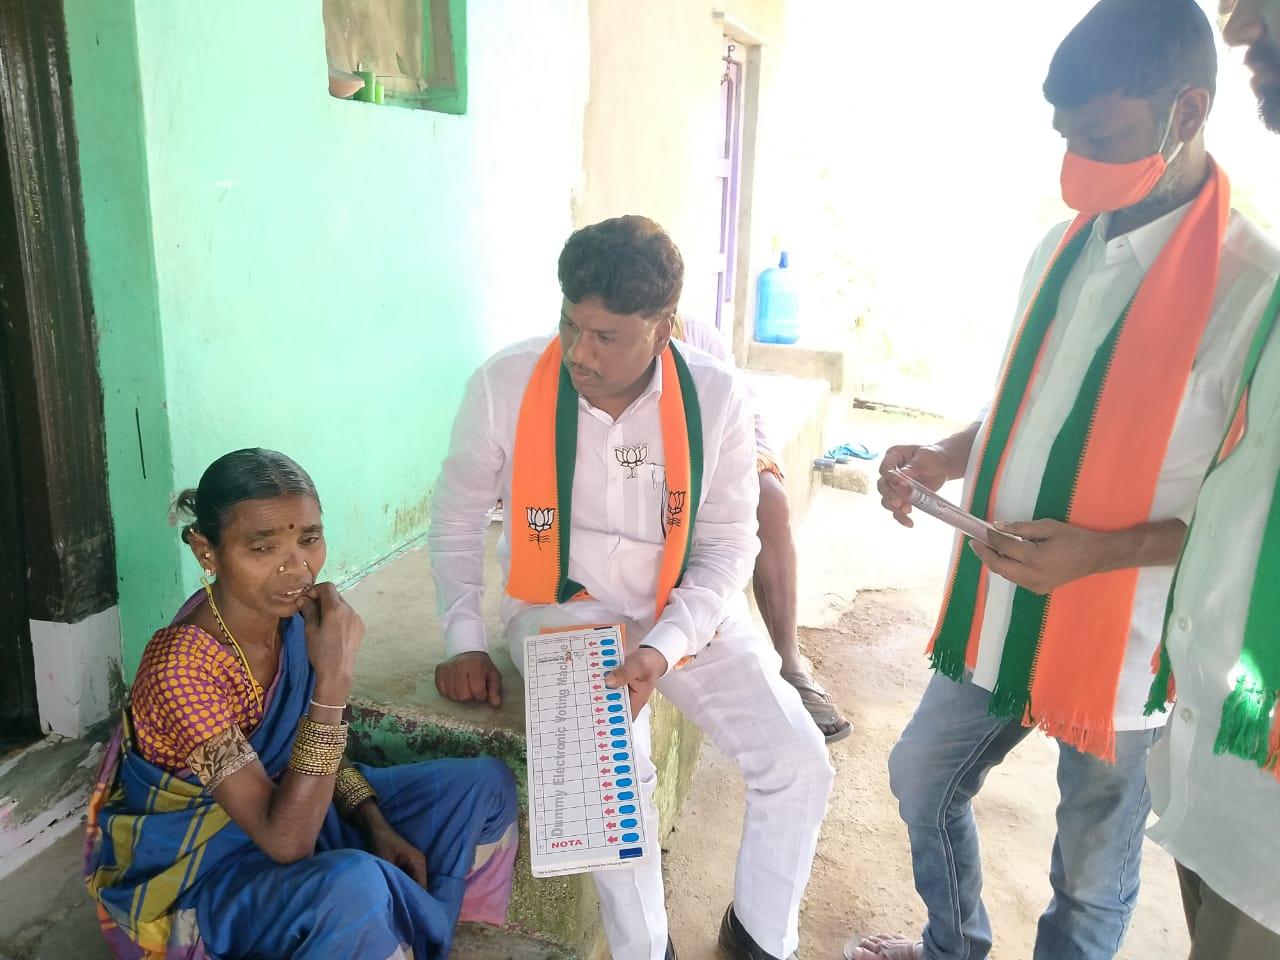 Sheelam Raju   District Vice-President   BJP   Kisan Morcha District Executive of Karimnagar   District Executive   District Spokesperson   District Commissioner   Party Activist   Social Activist   Gudem   Mustabad   Rajanna Sircilla   Telangana   theLeadersPage